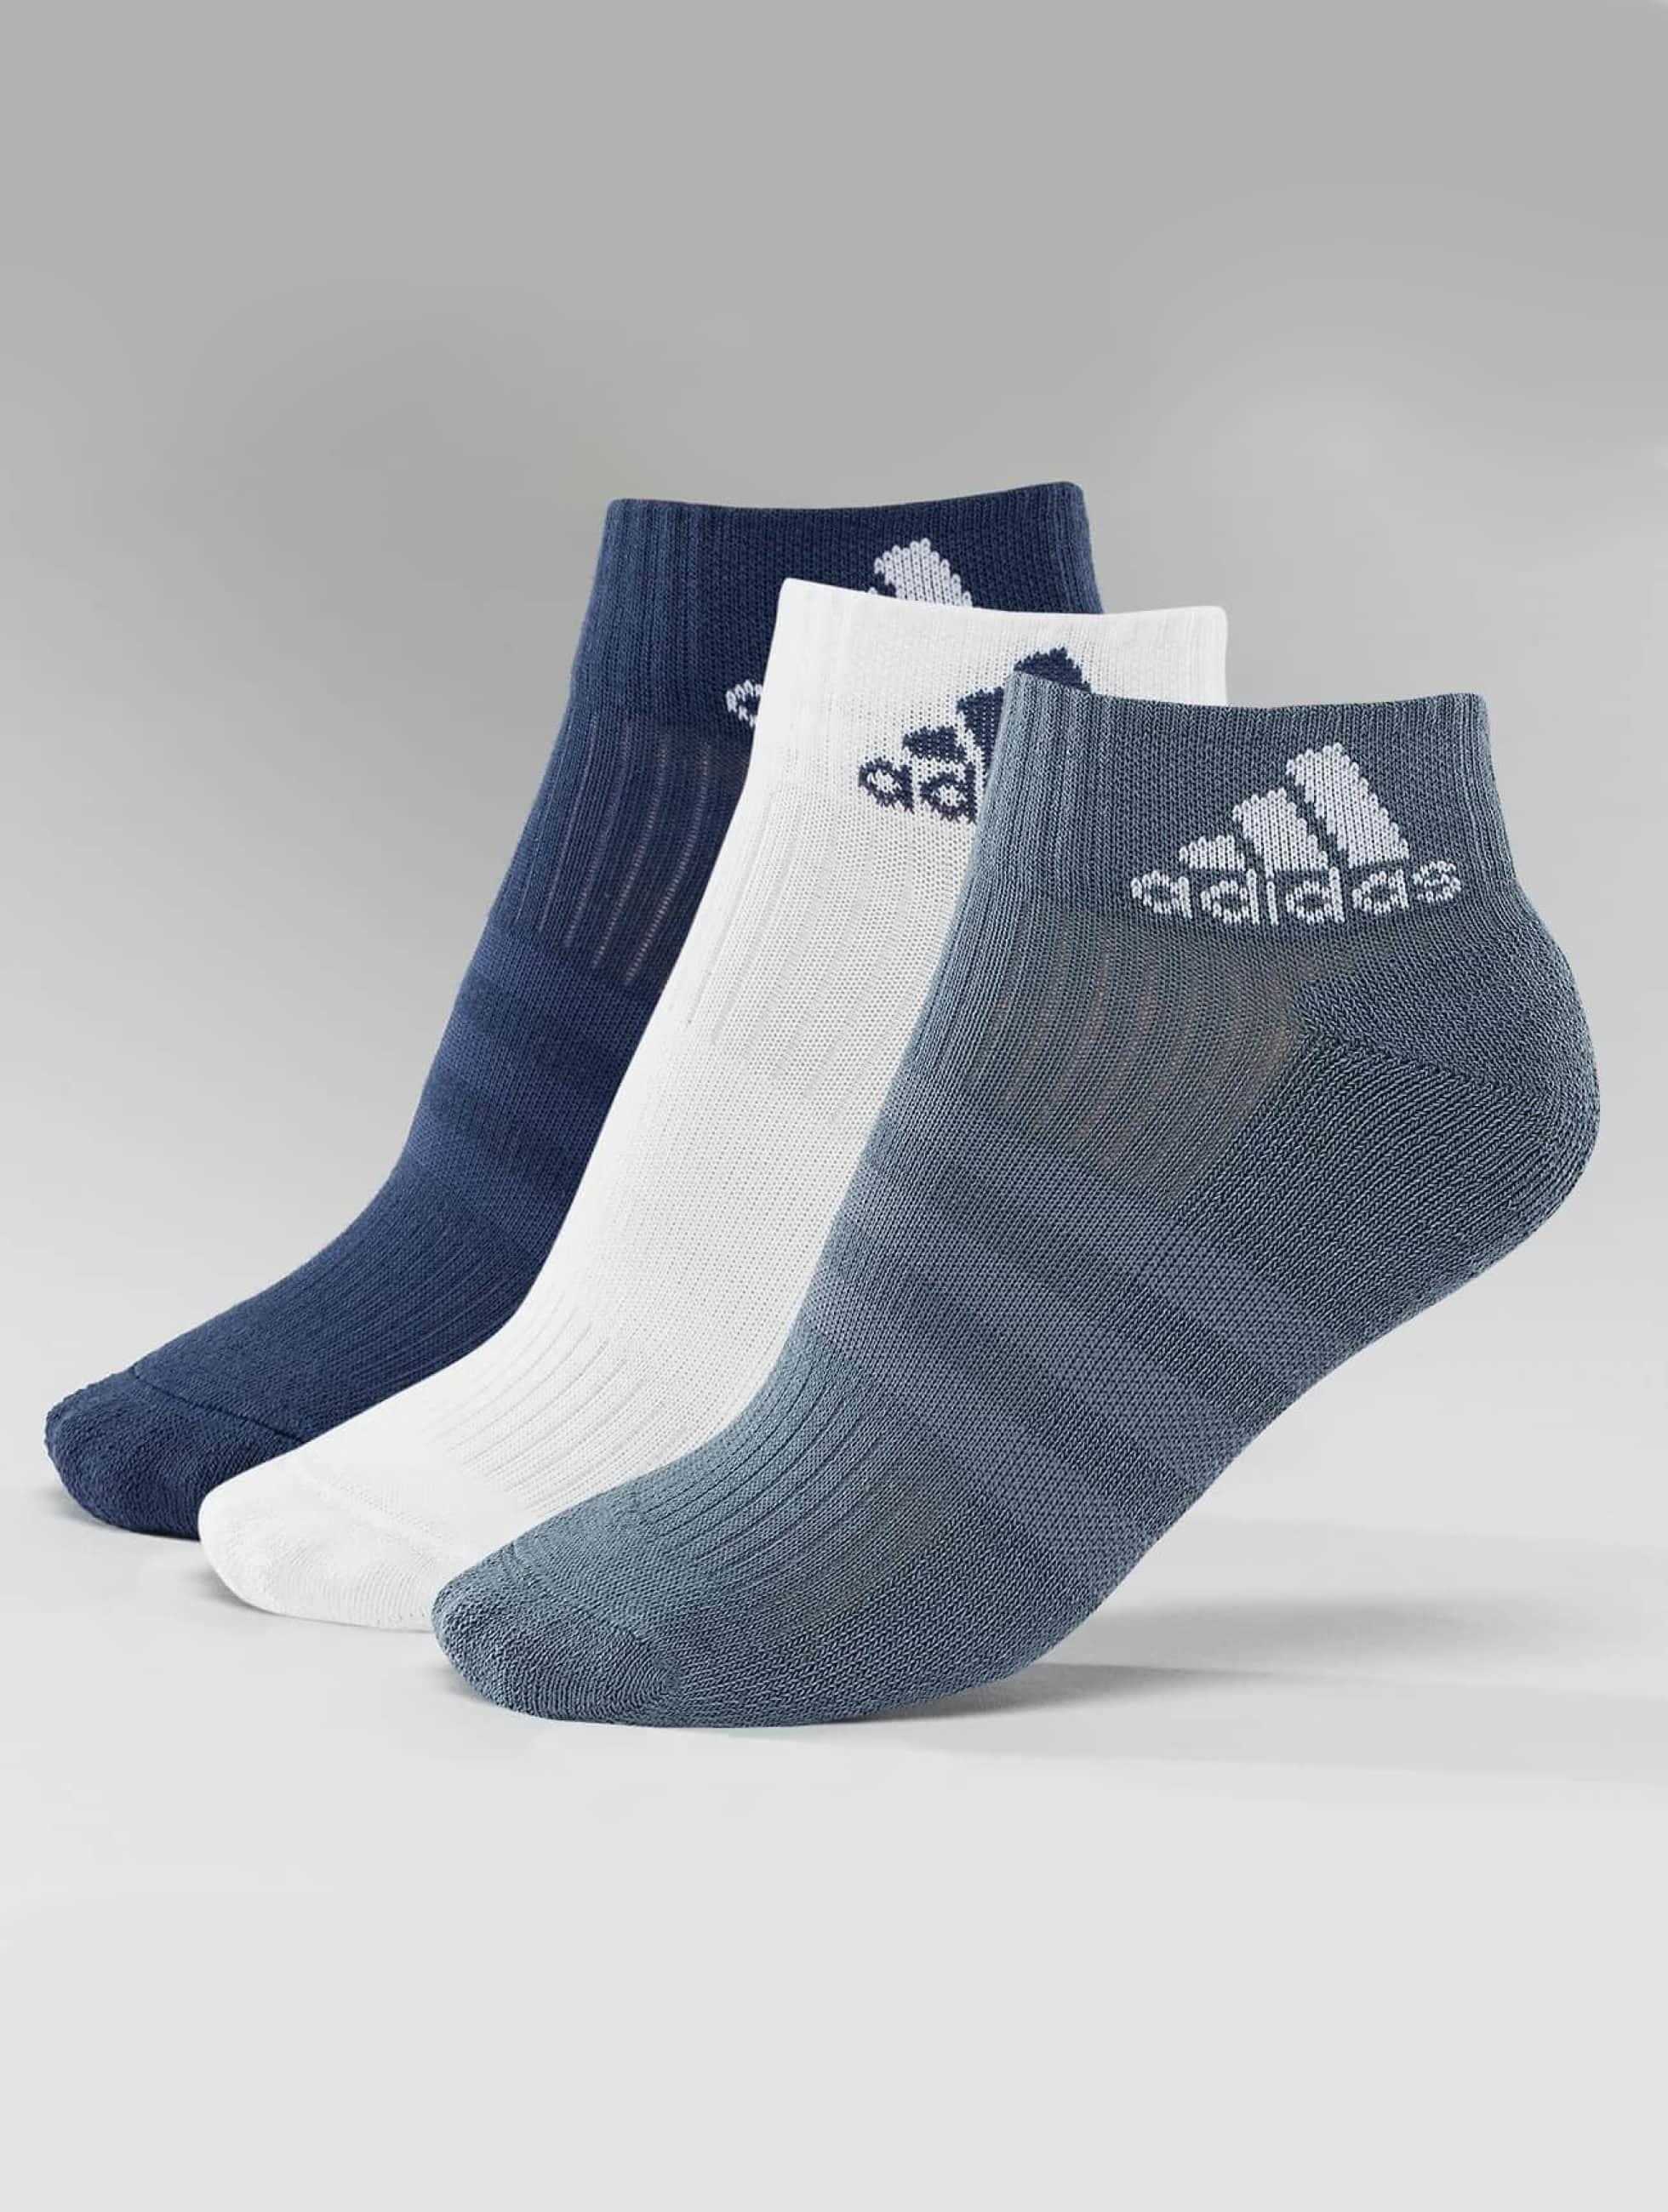 adidas originals Calzino 3-Stripes Per An HC 3-Pairs blu